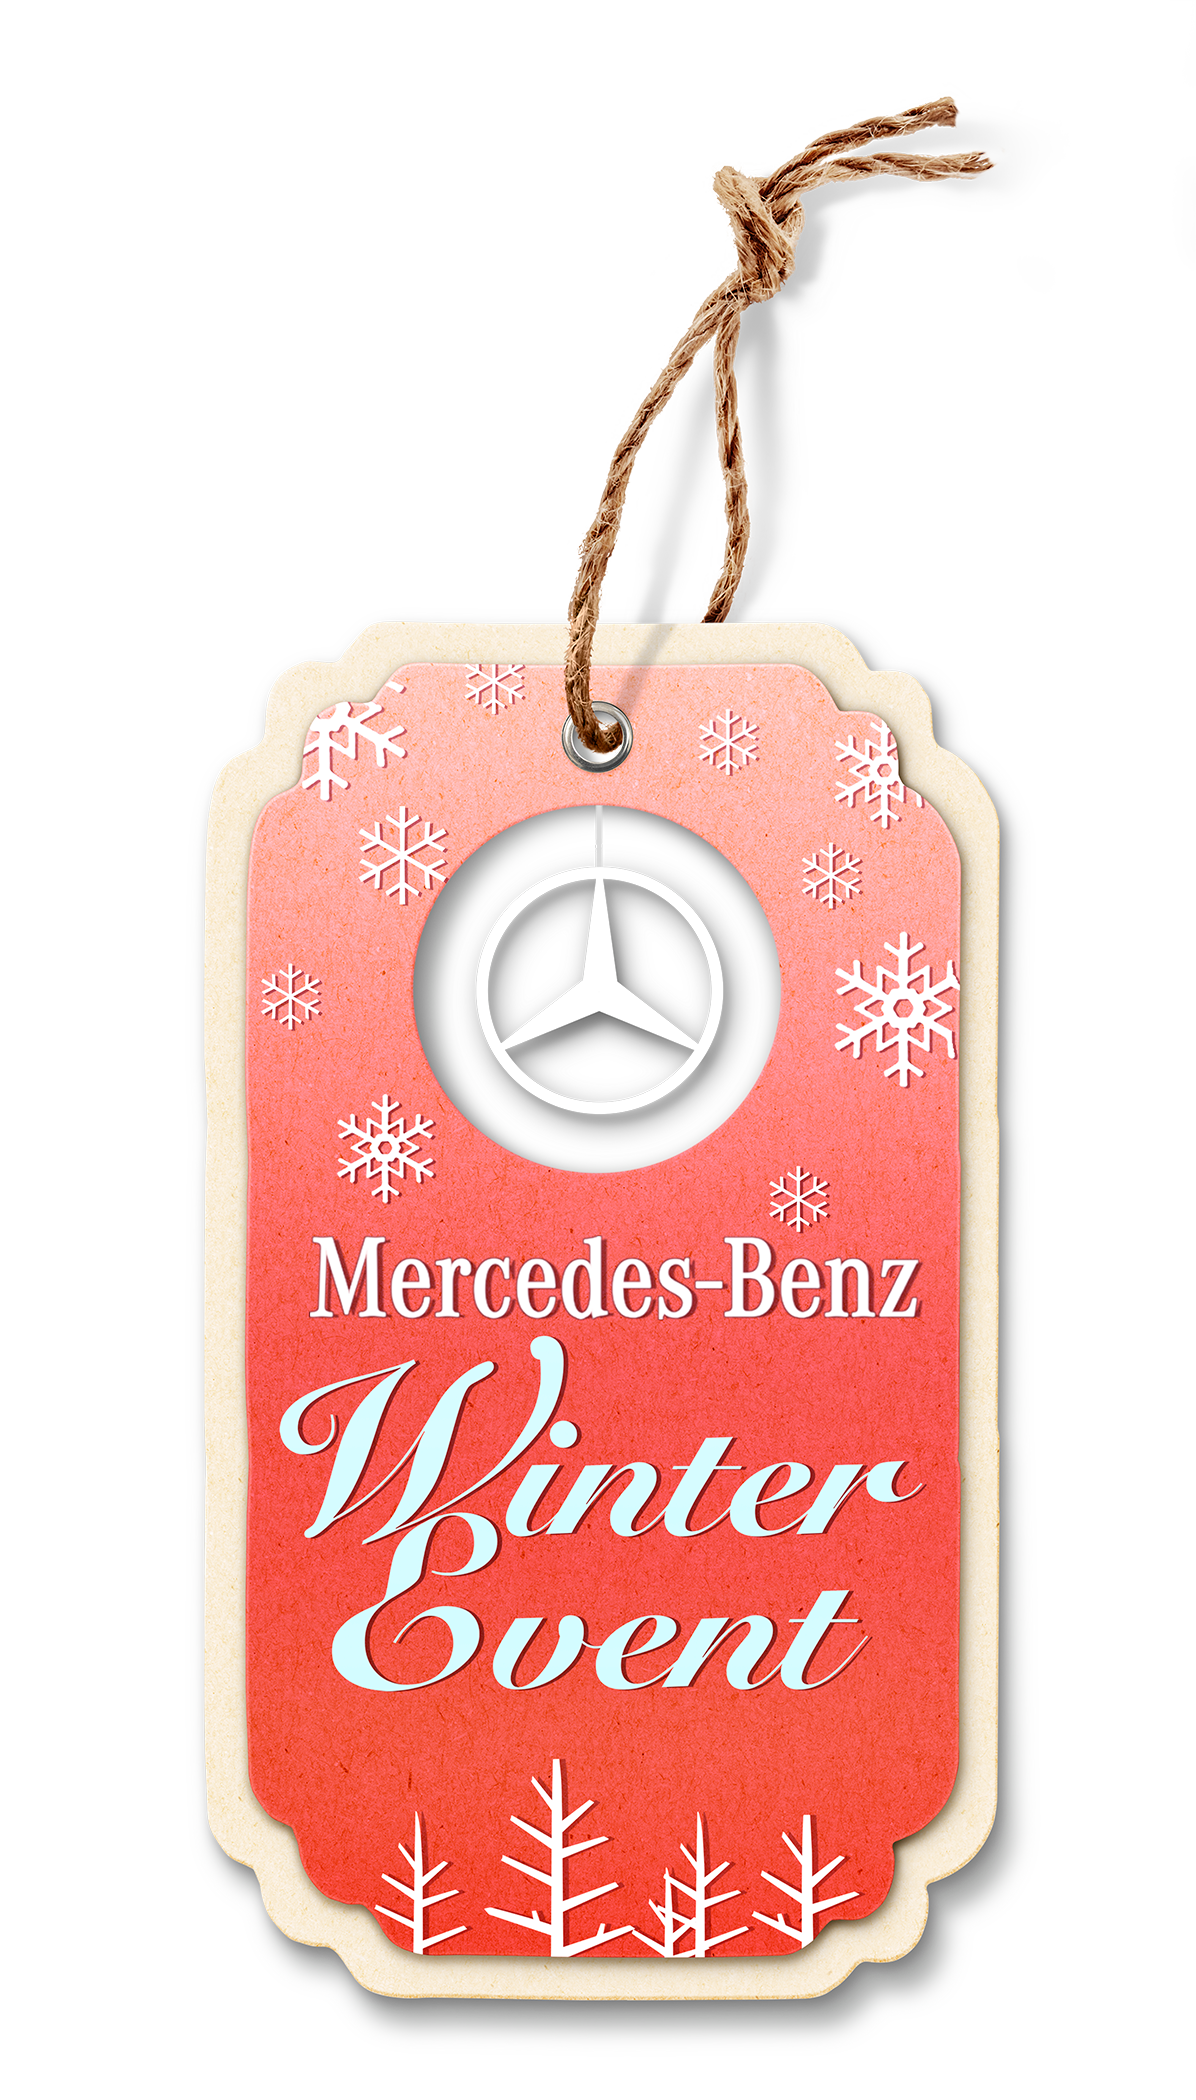 Mercedes Dealers In Ct >> Mercedes-Benz Winter Event in CT | Hartford Mercedes-Benz ...